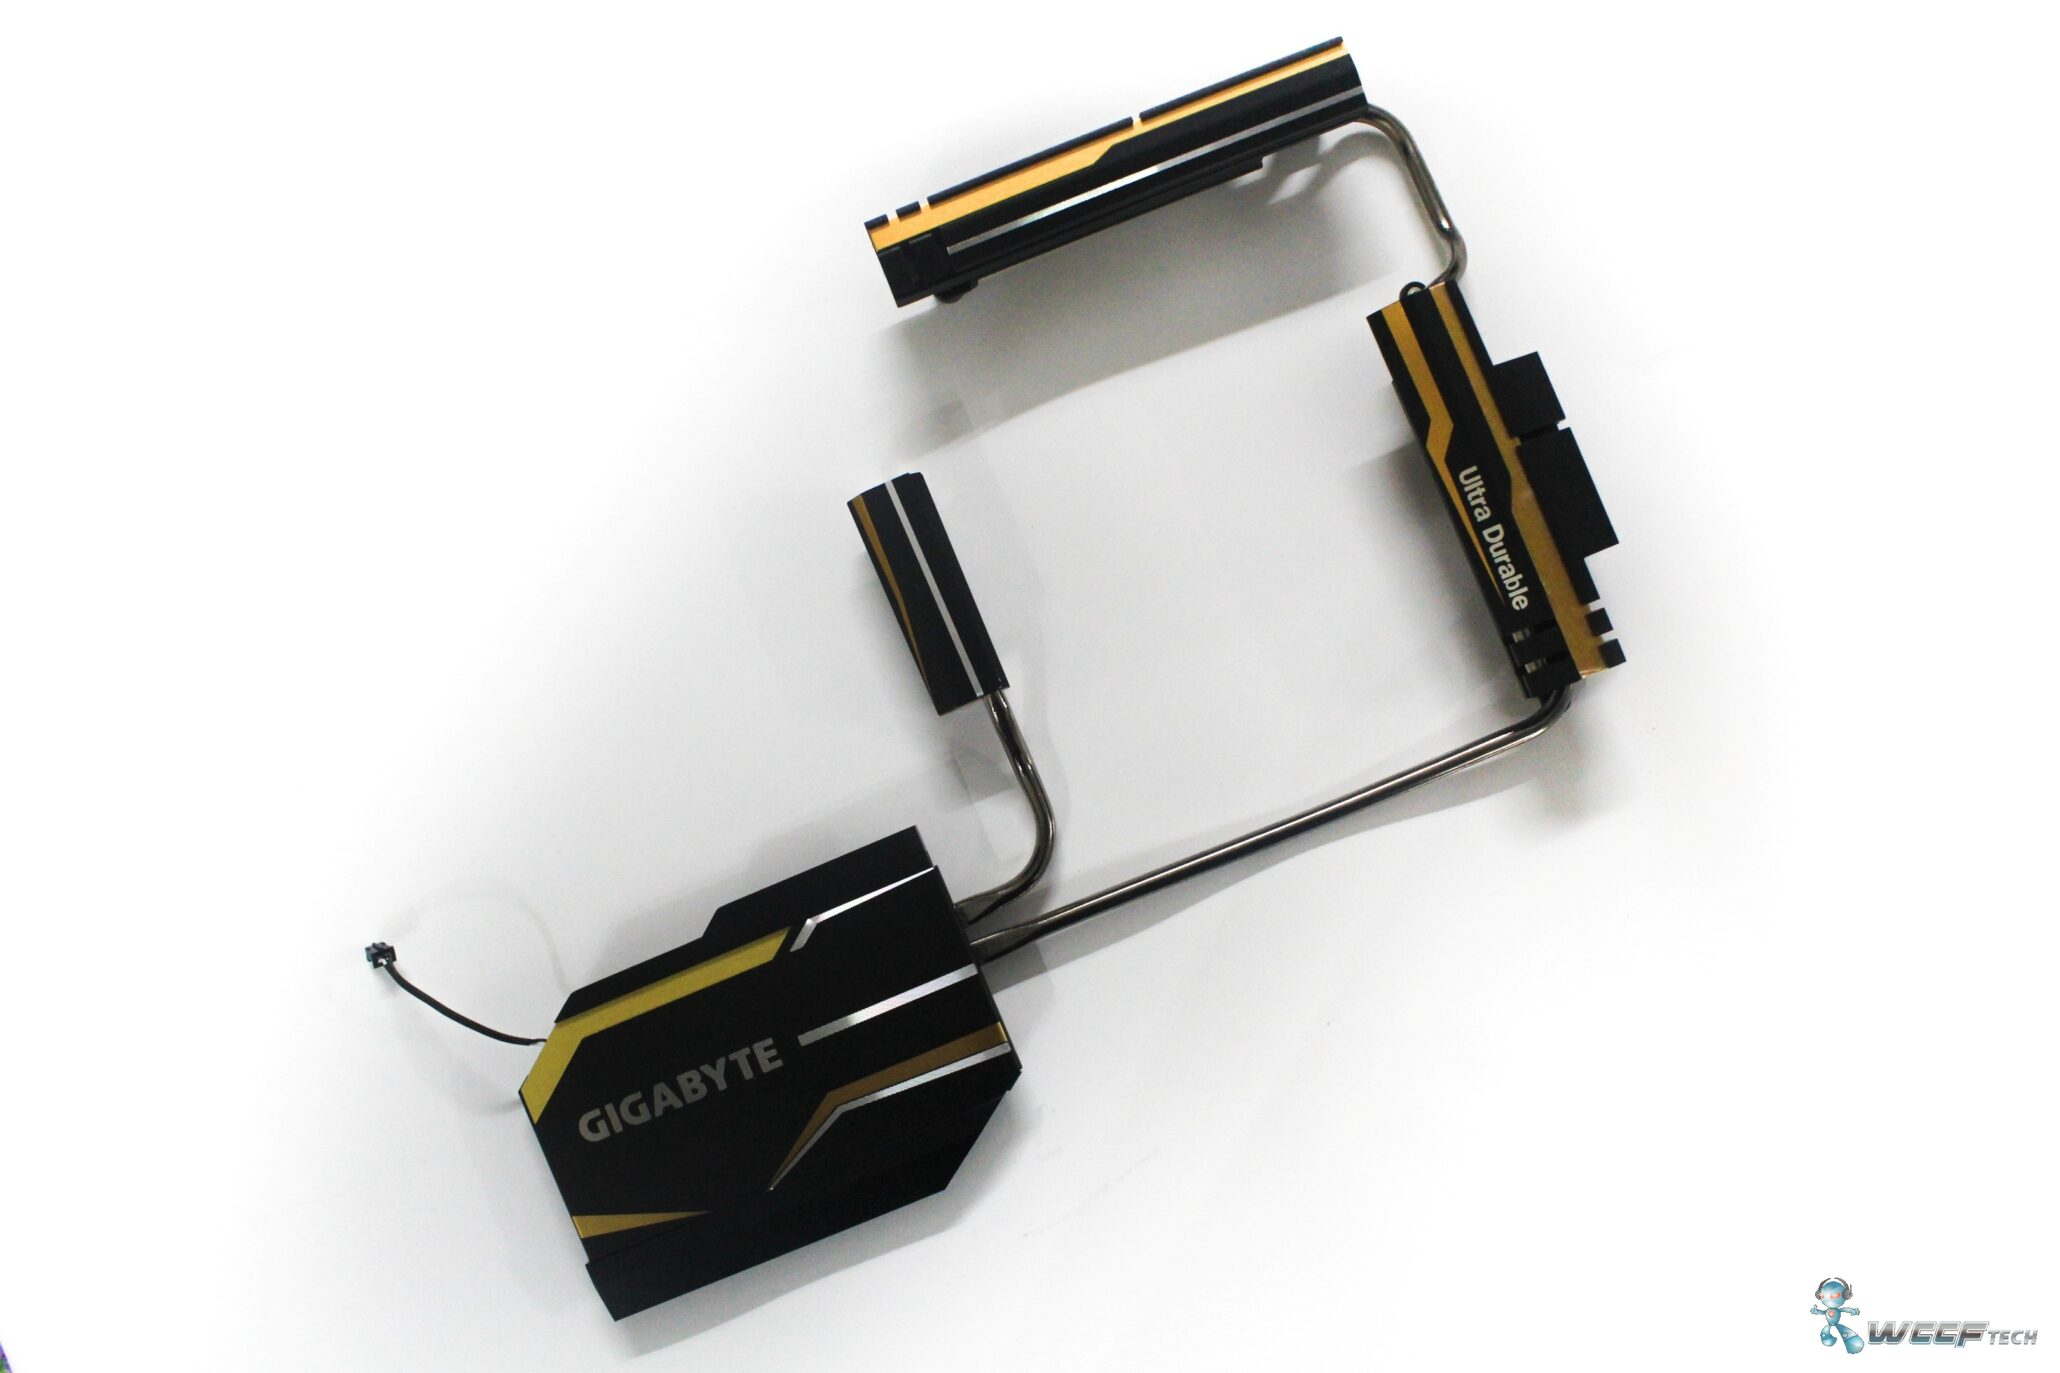 gigabyte-x99-ud7-wifi_heatsinnk-off-1